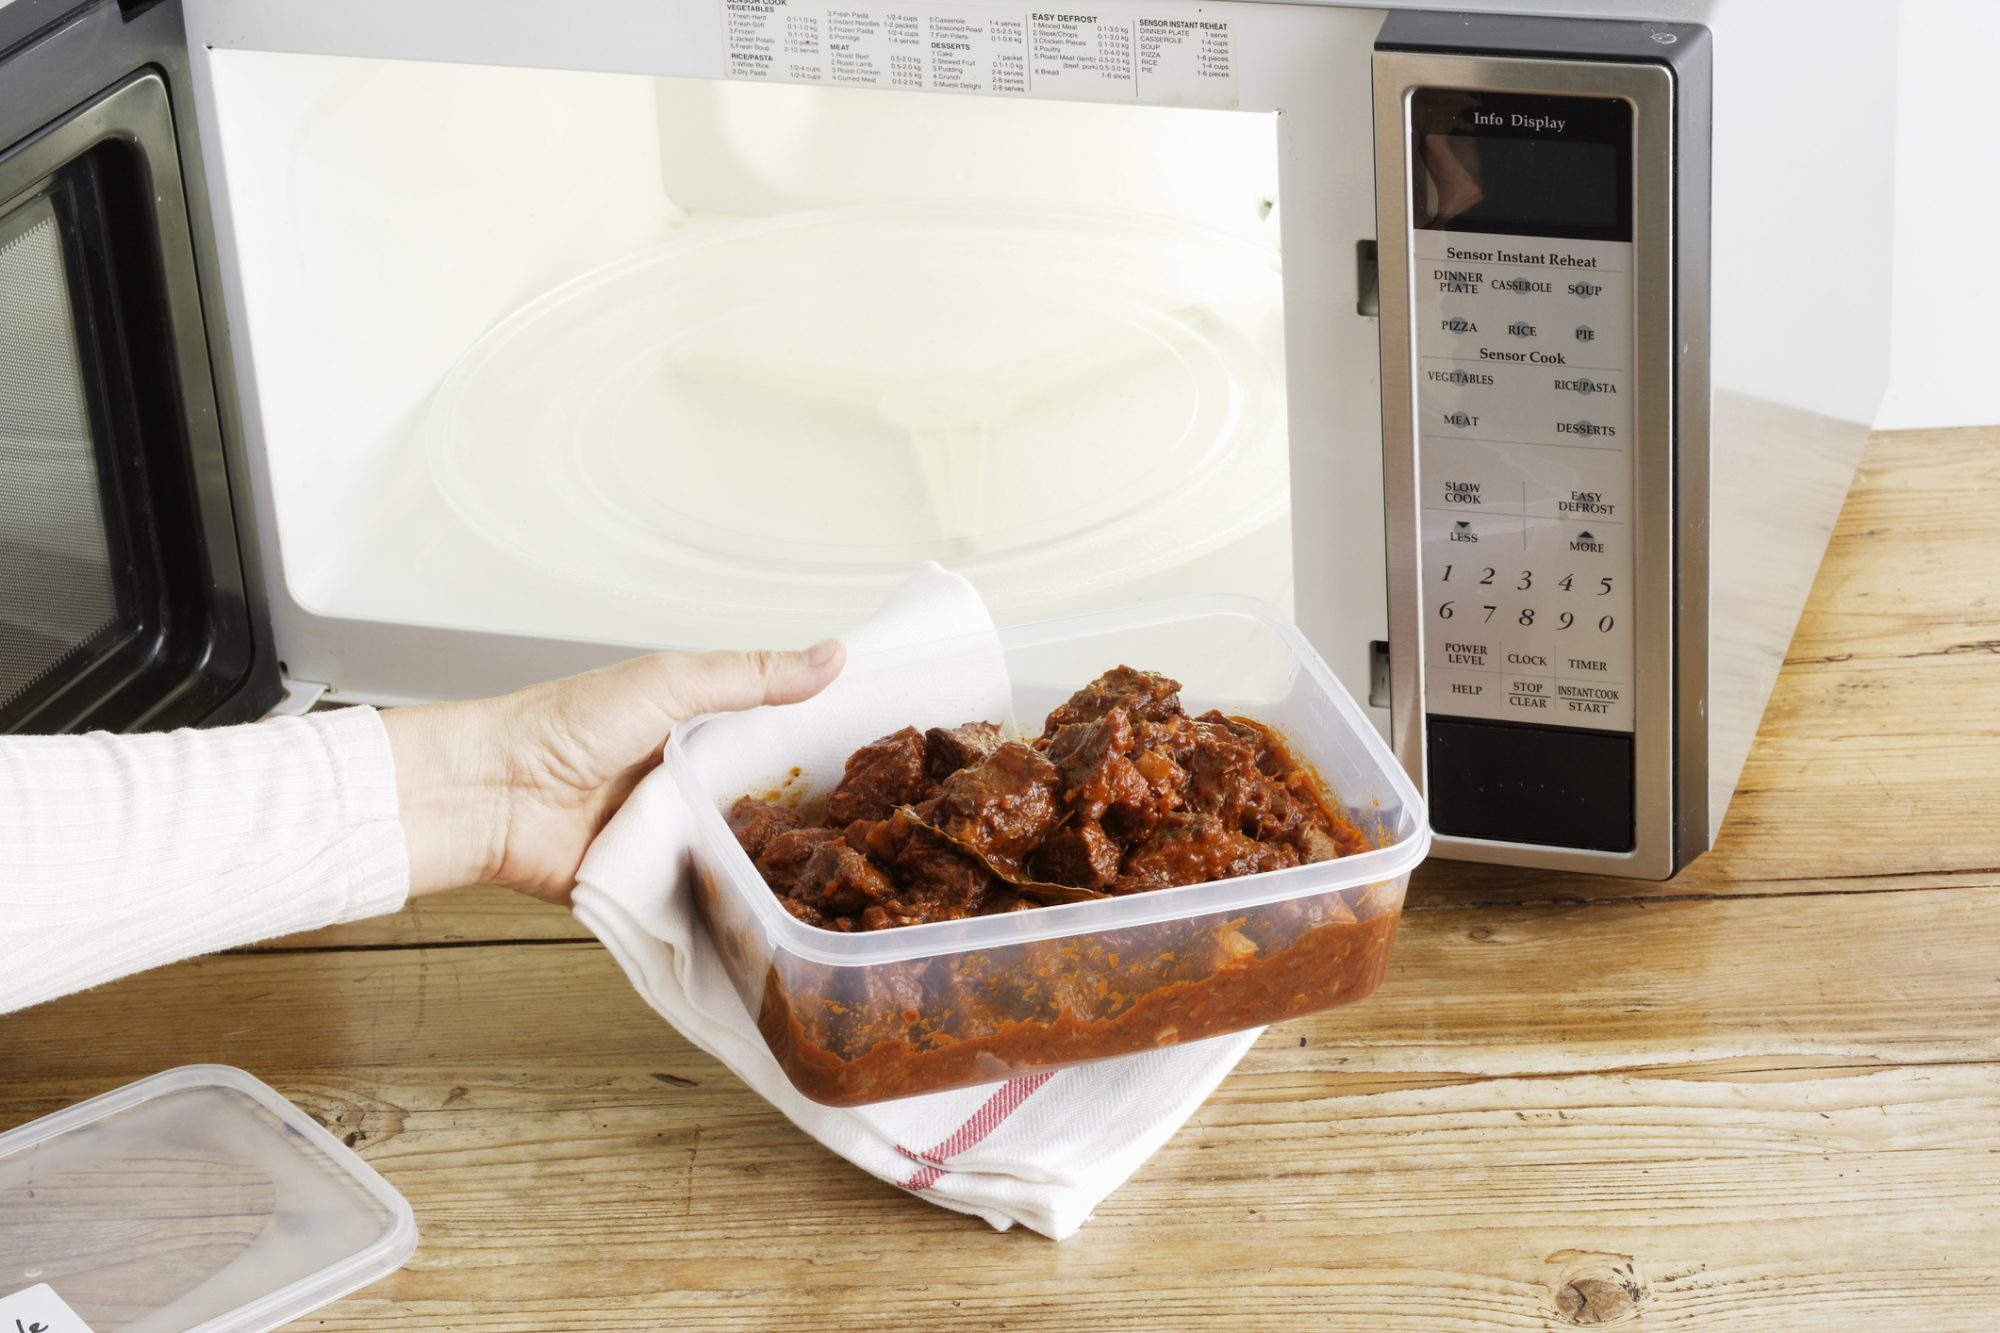 Easy dinner recipes to reheat